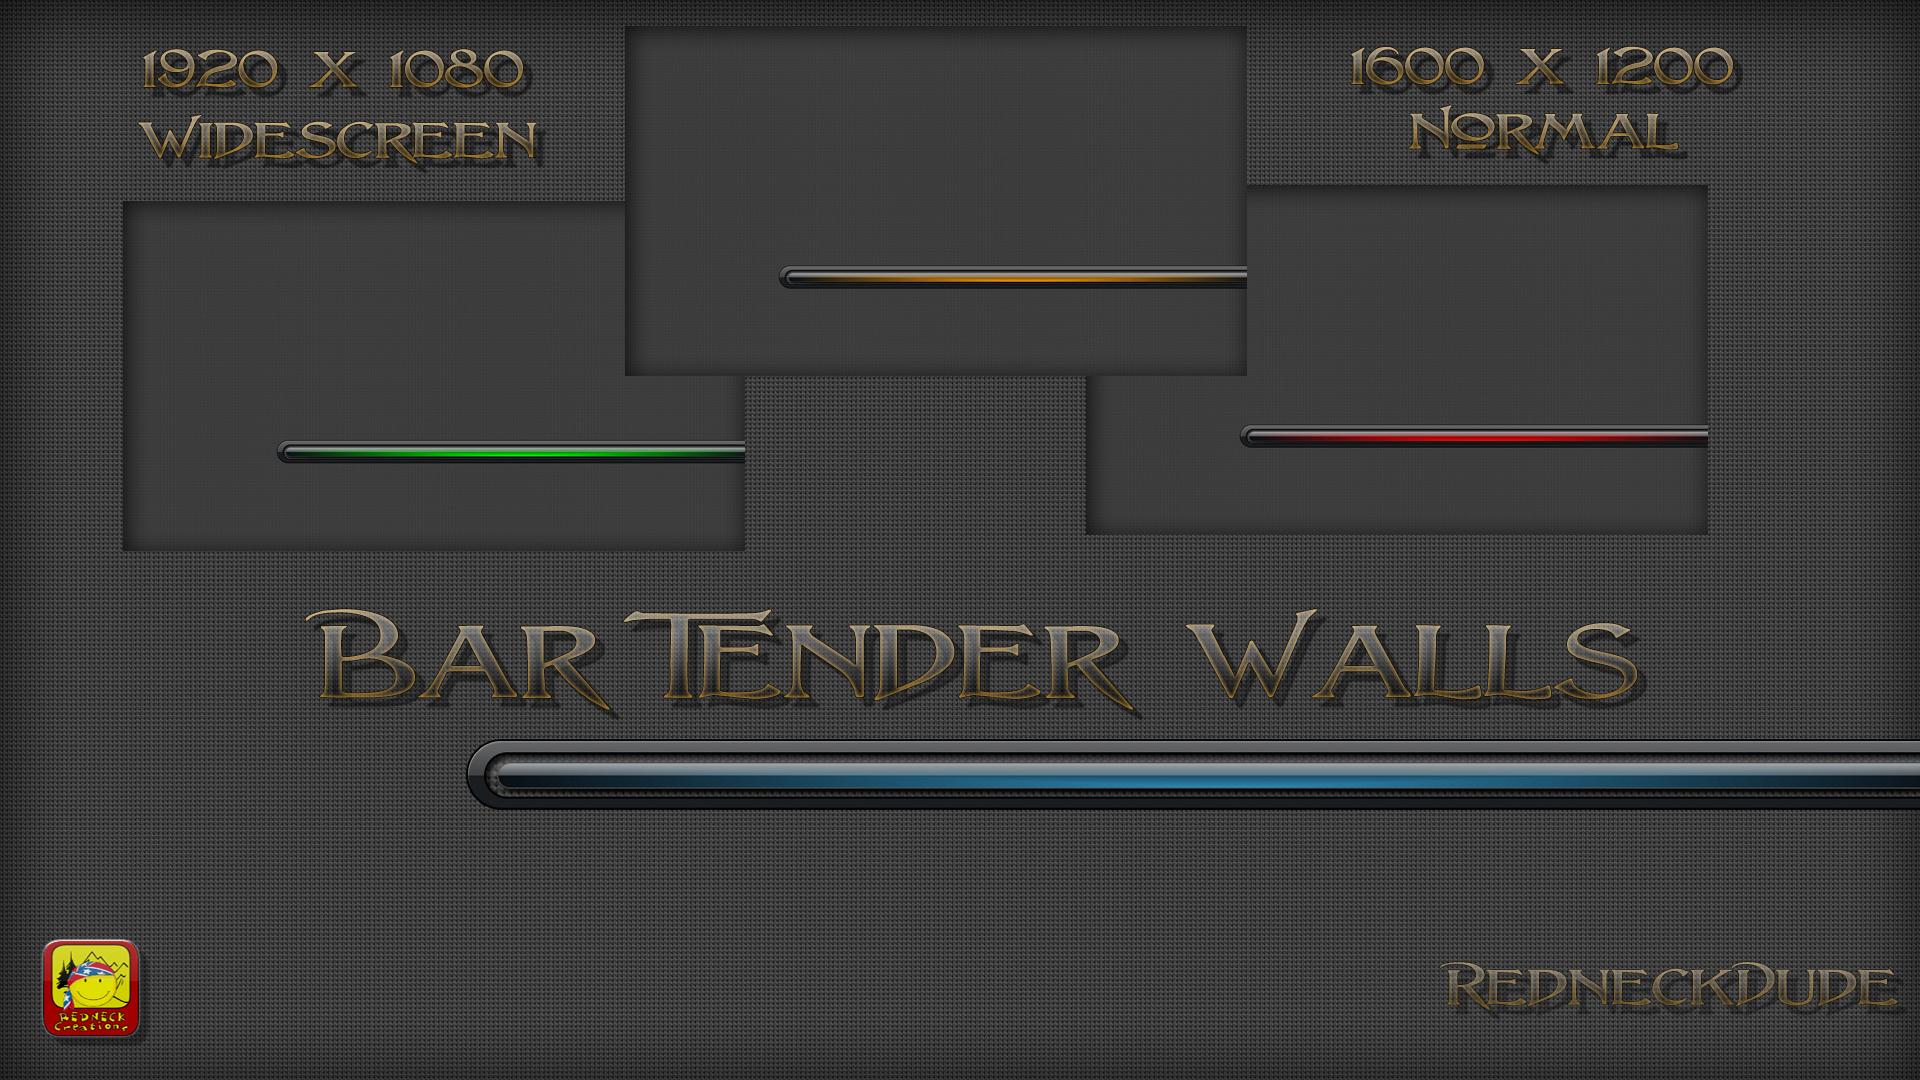 Bar Tender Walls